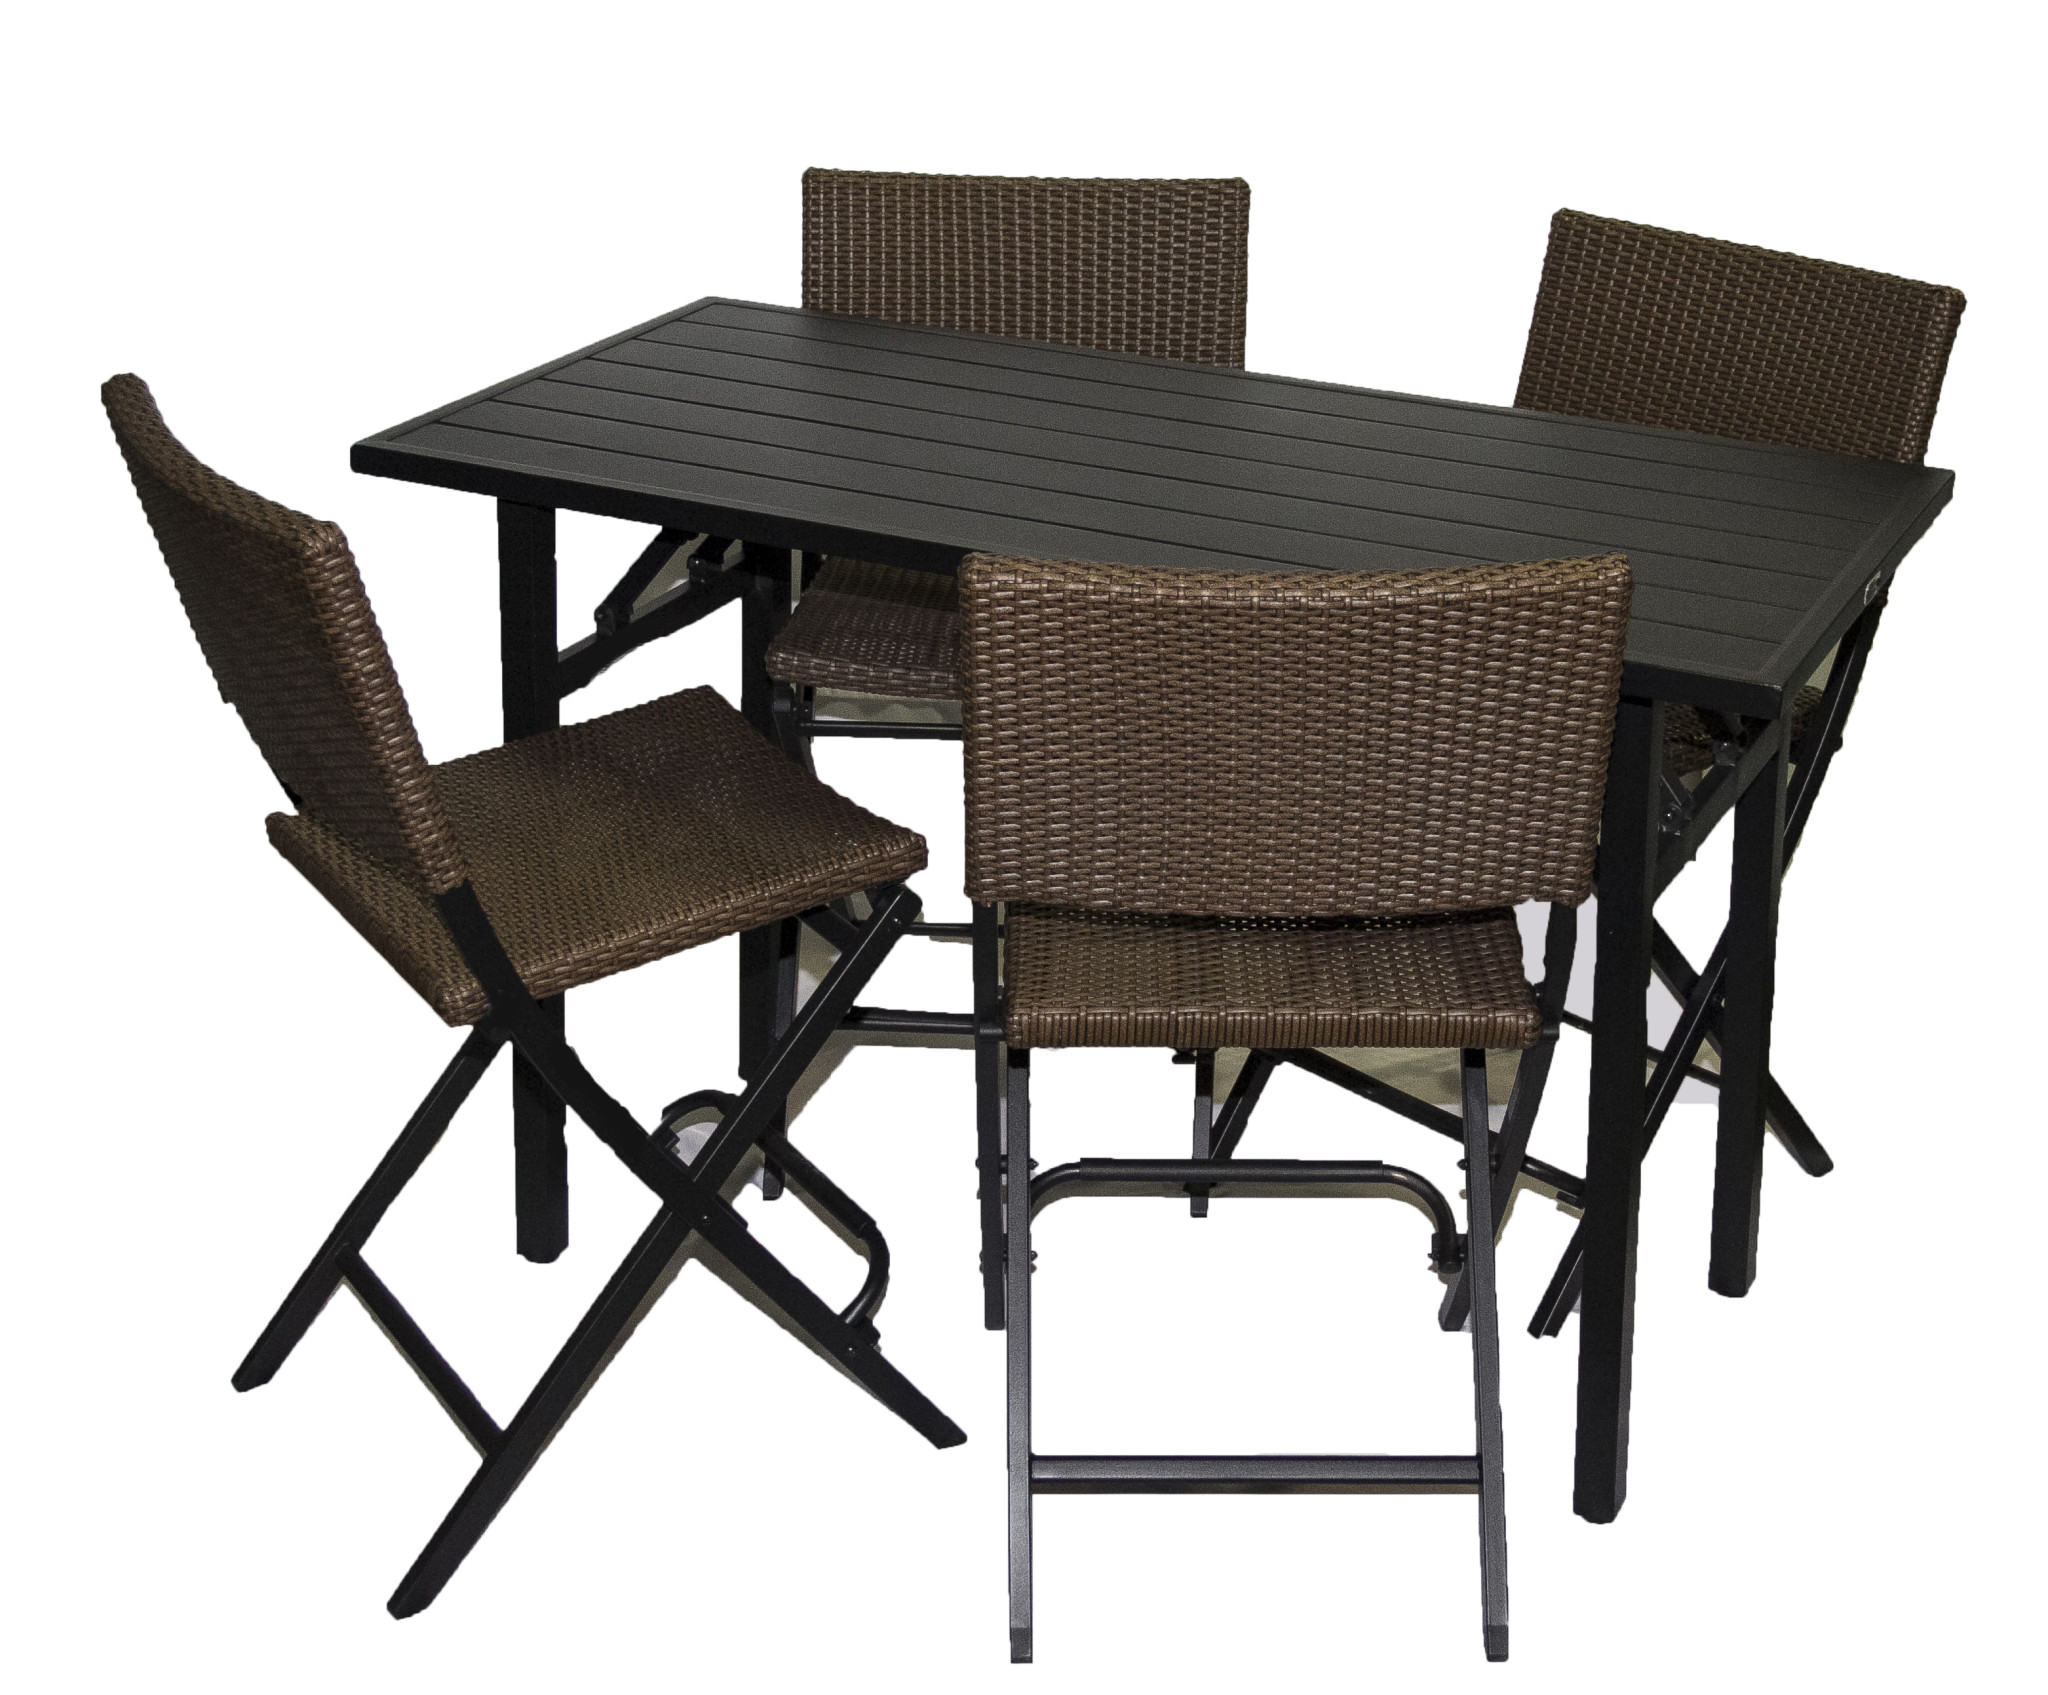 bar height patio set - Bar Height Patio Set